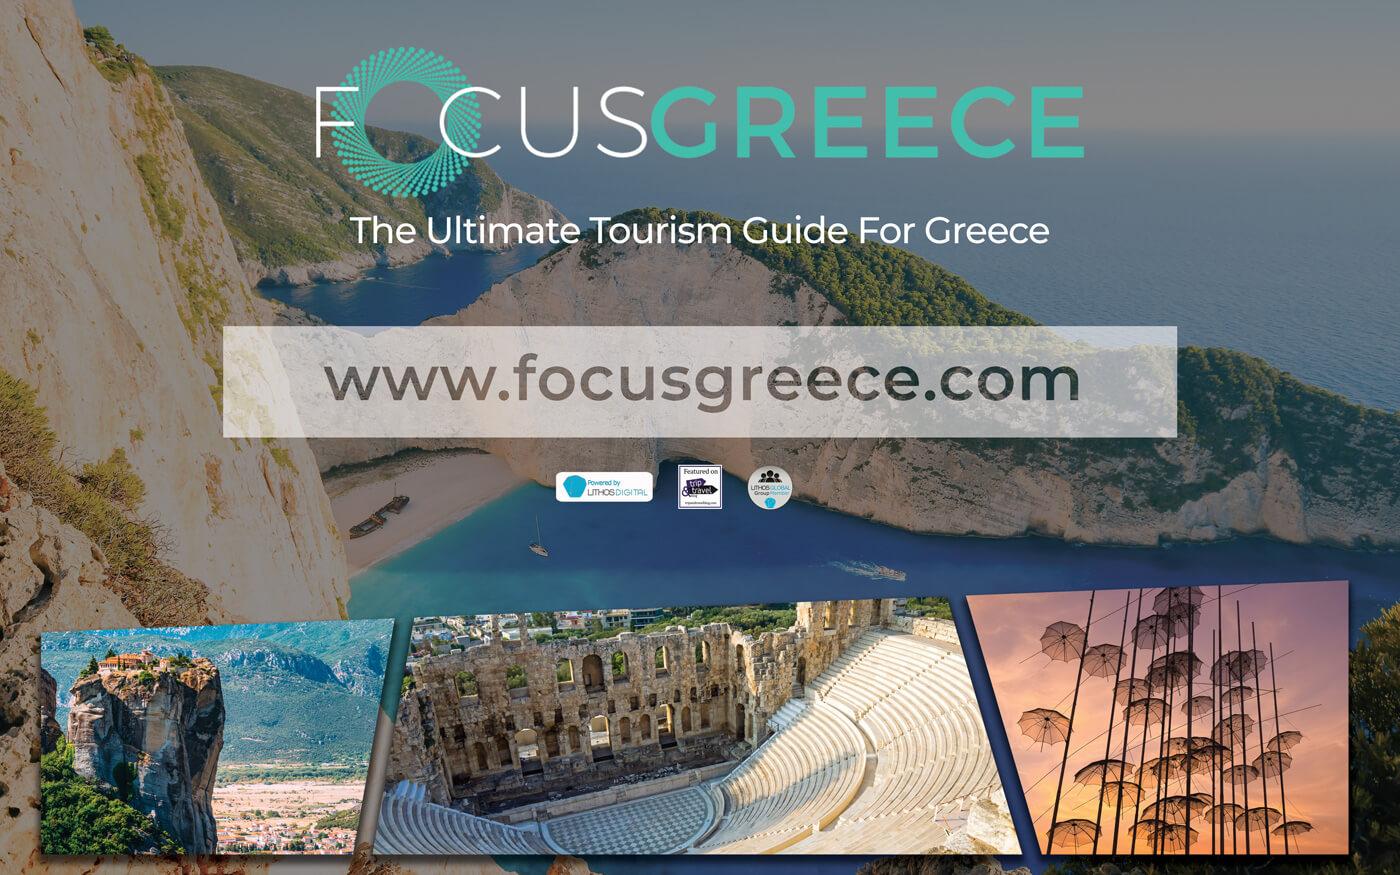 Focus Greece - The Ultimate Tourism Guide For Greece 97e22018257